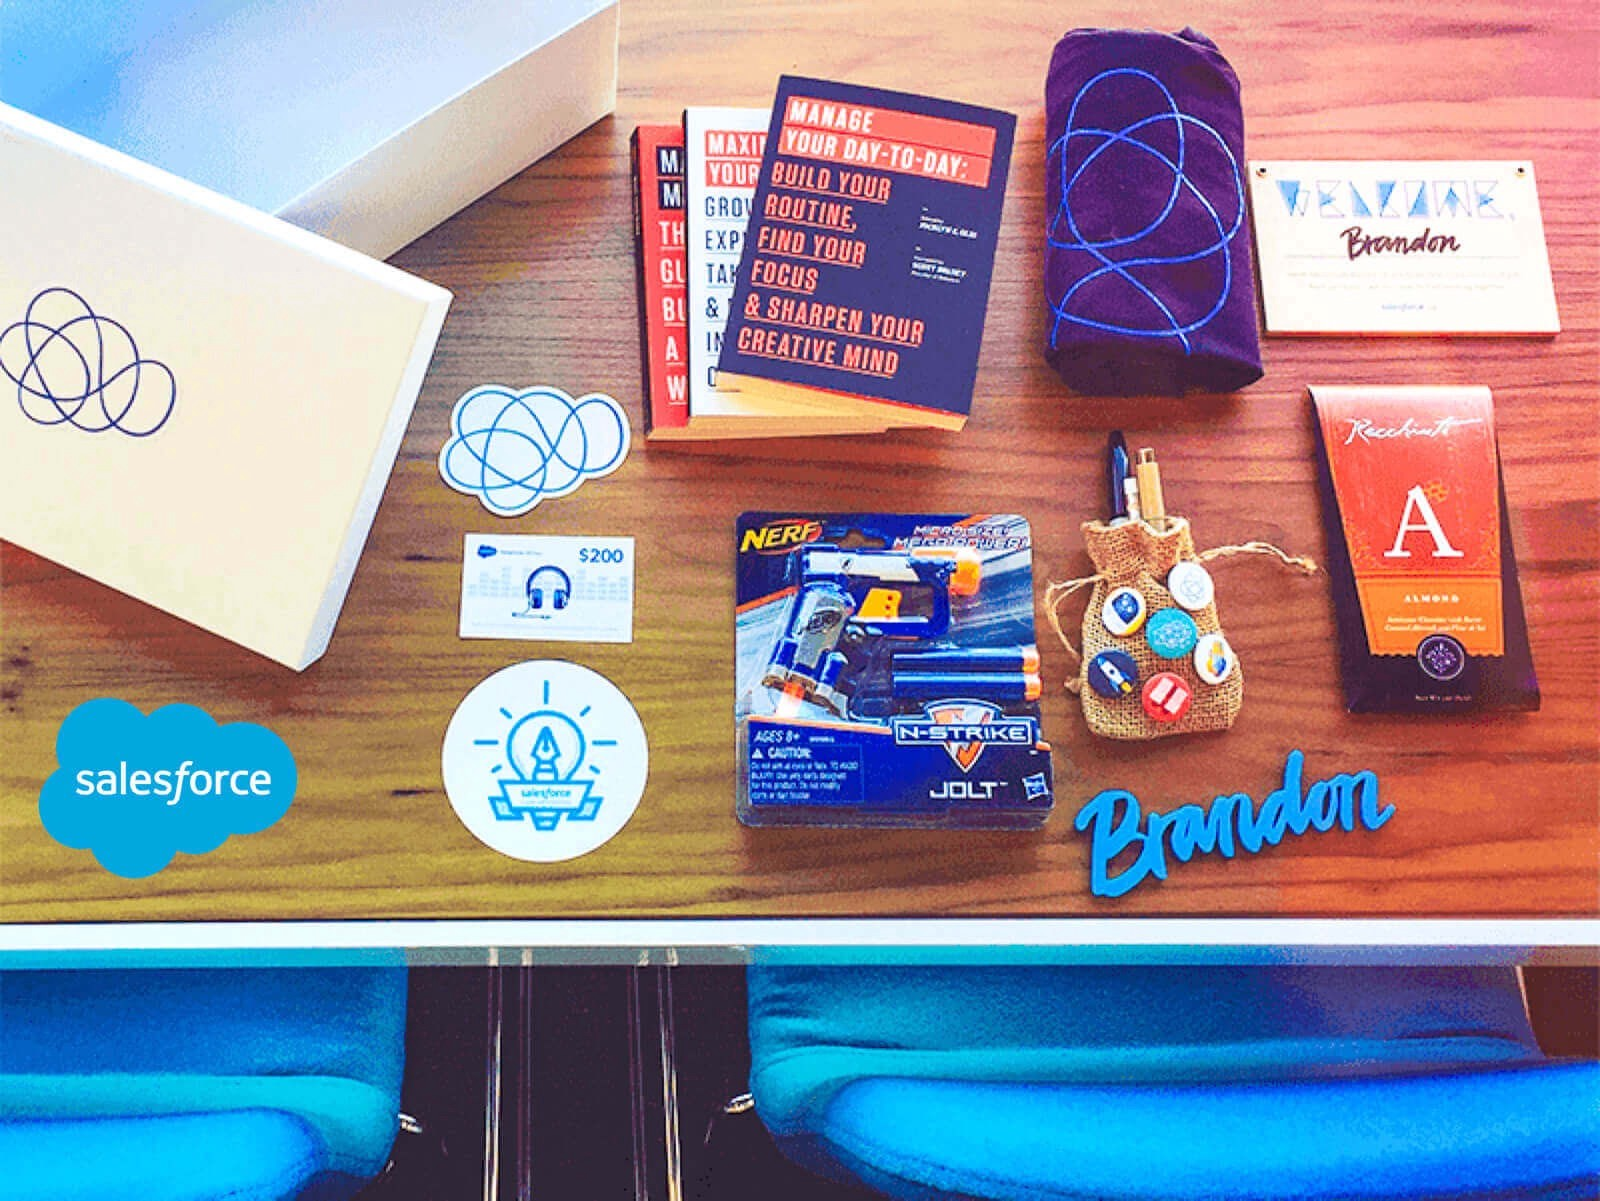 Salesforce Welcome Kit